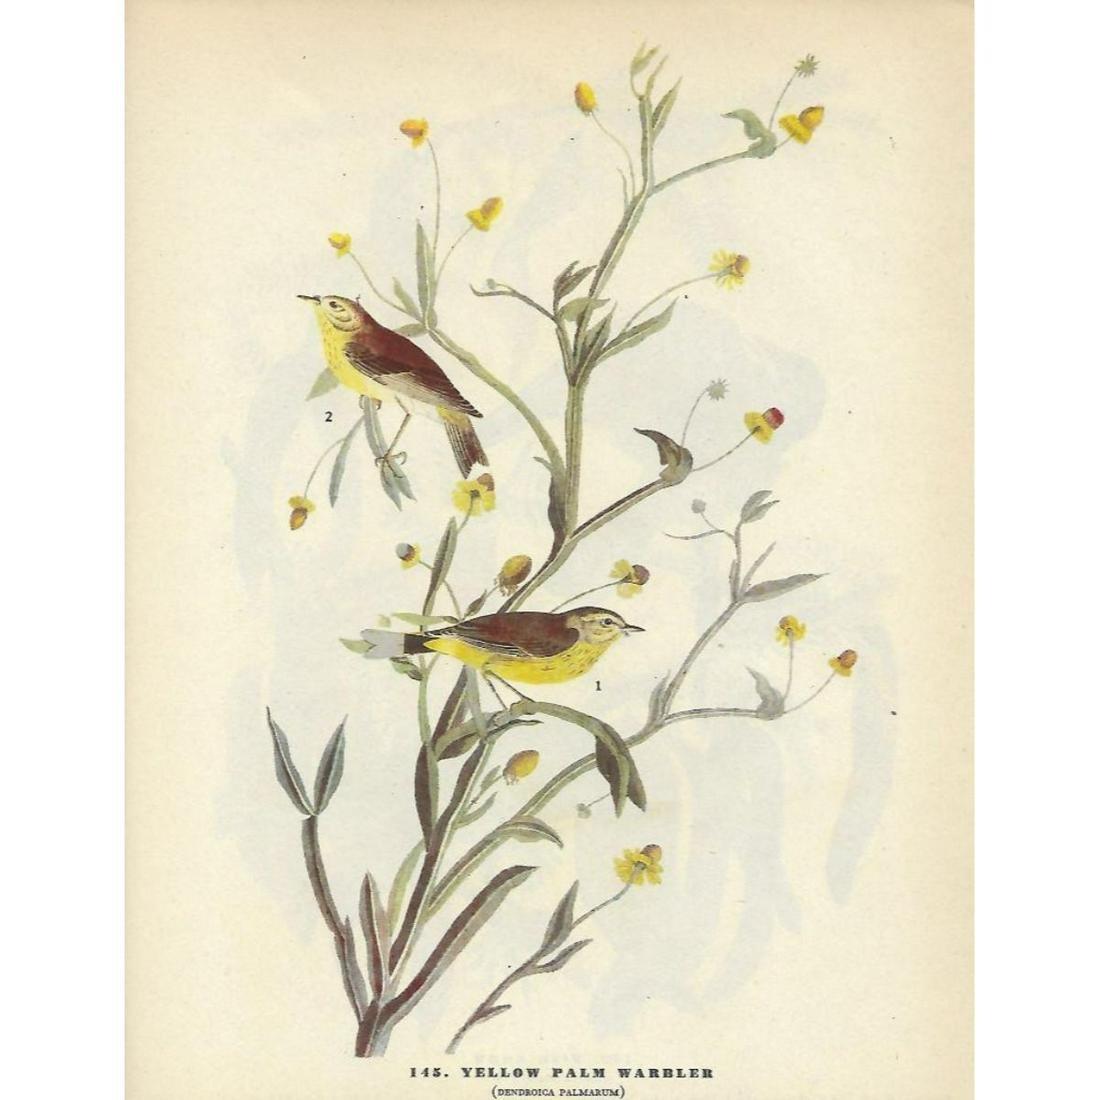 c1946 Audubon Print, Yellow Palm Warbler